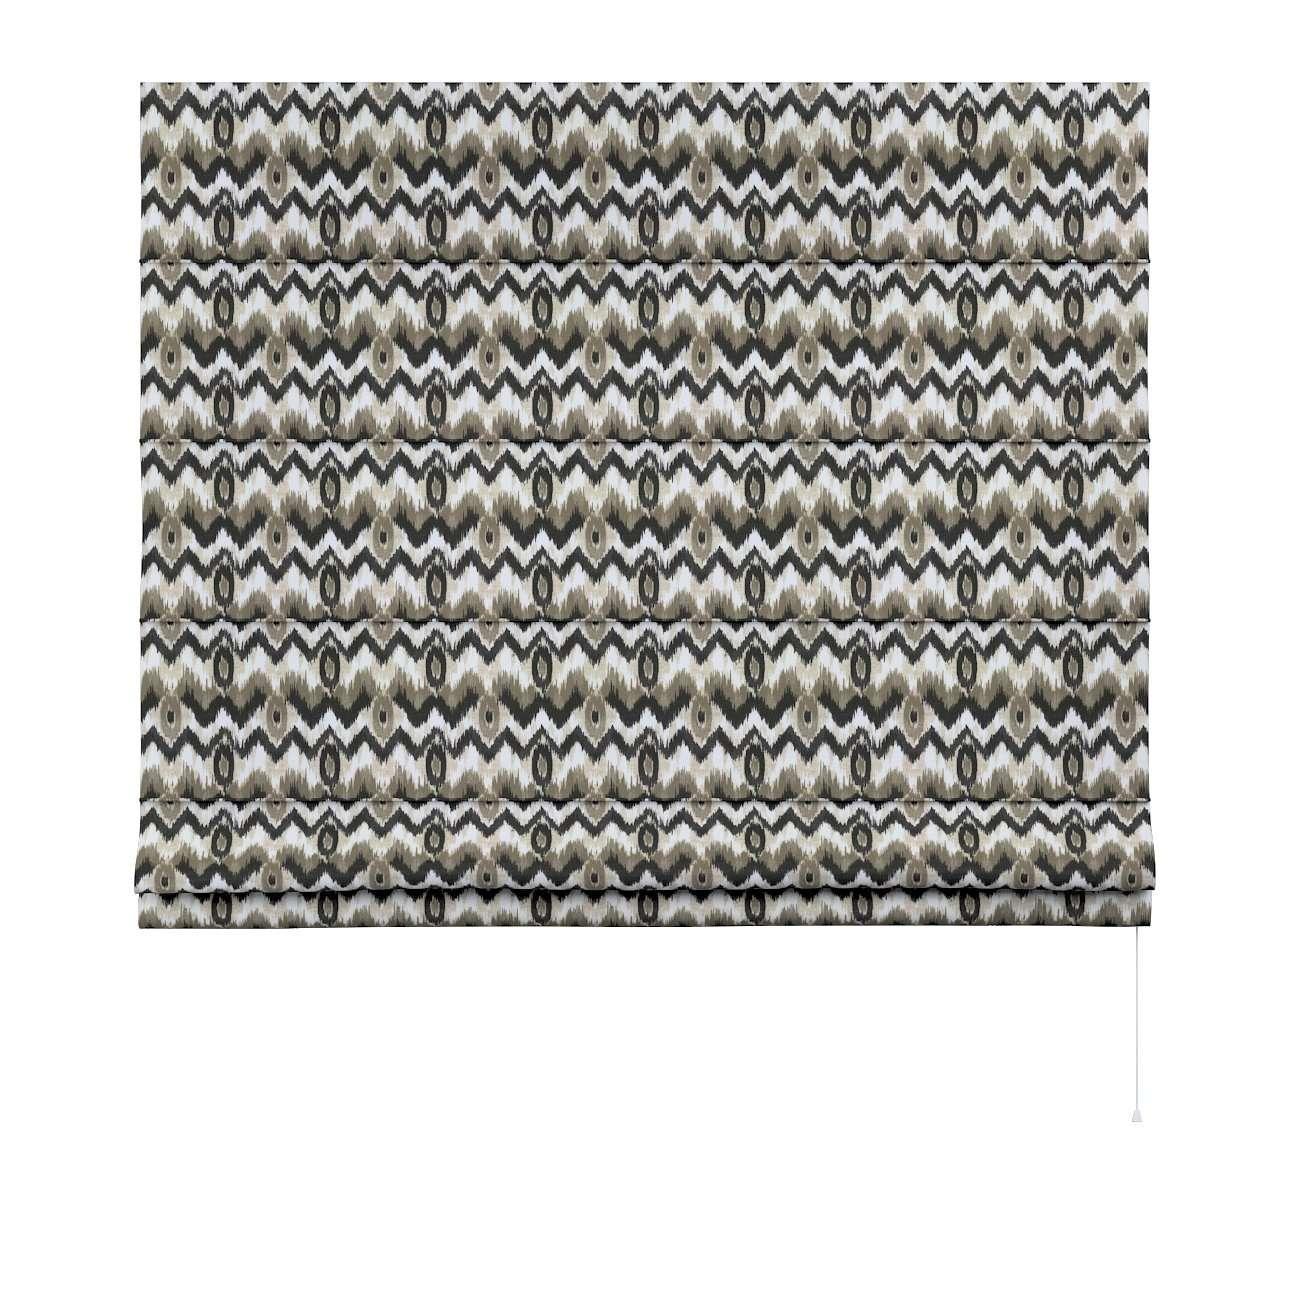 Rímska roleta Capri V kolekcii Modern, tkanina: 141-88